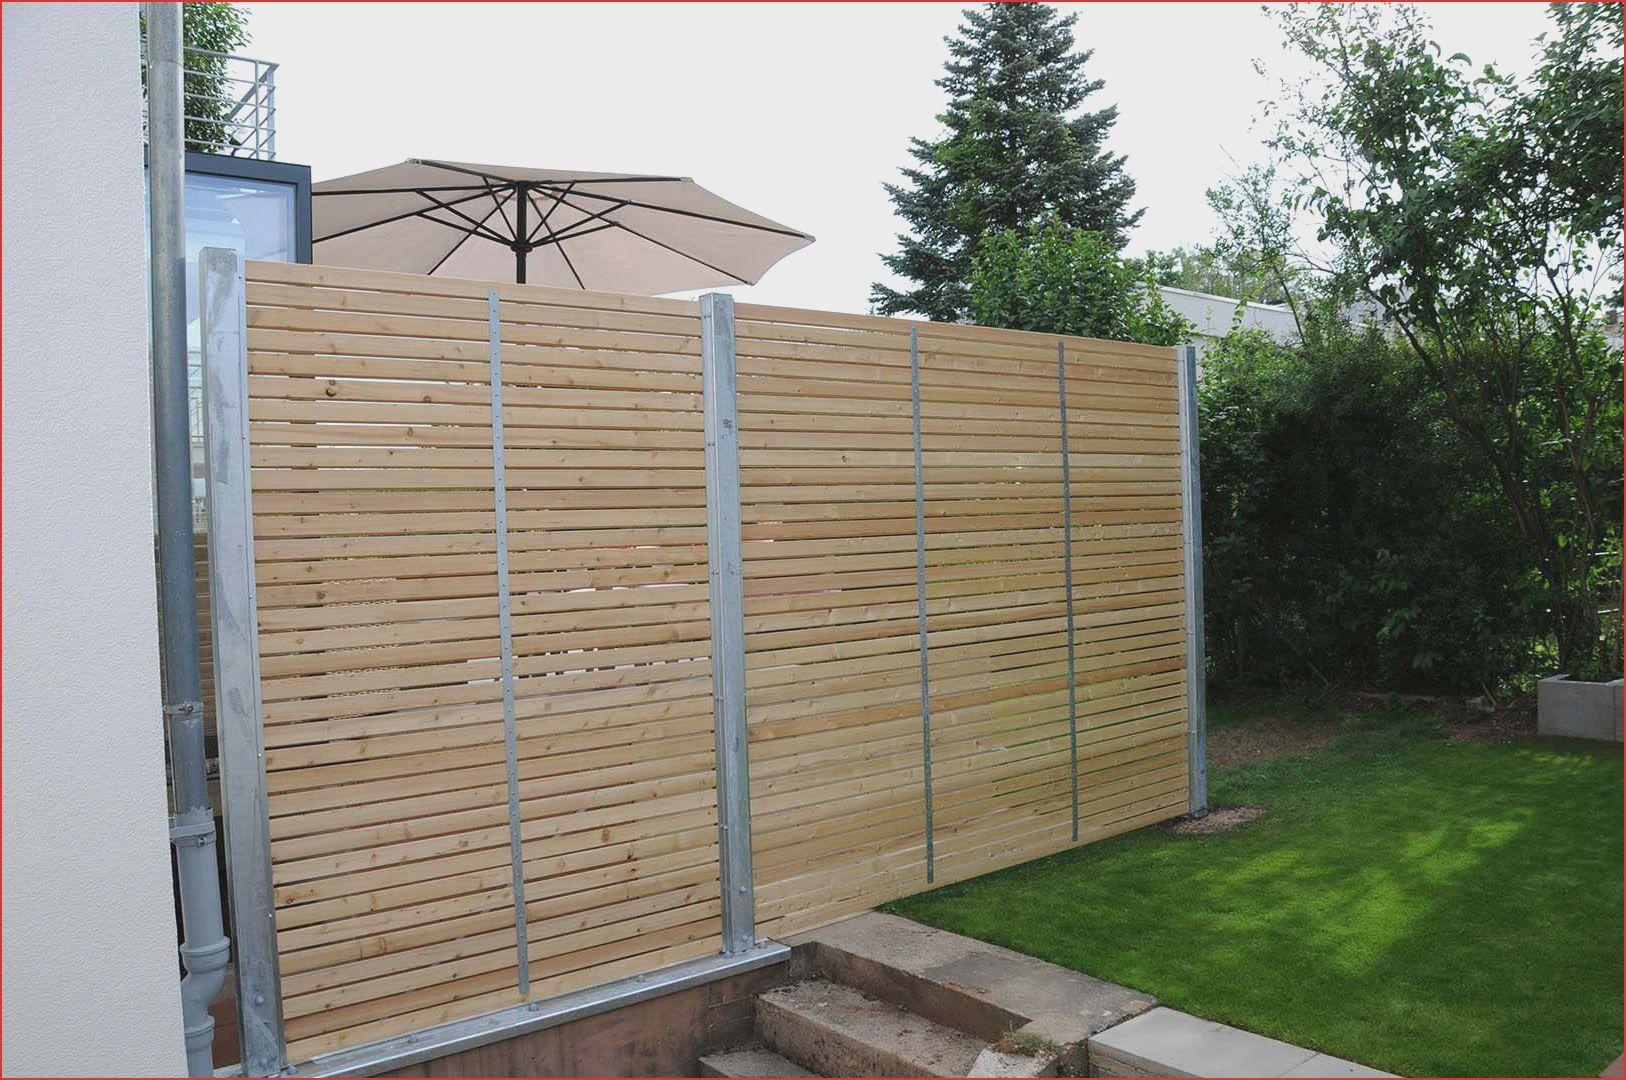 Garten Planen 27 Tolle Sichtschutzzaun Holz Weiss O15p